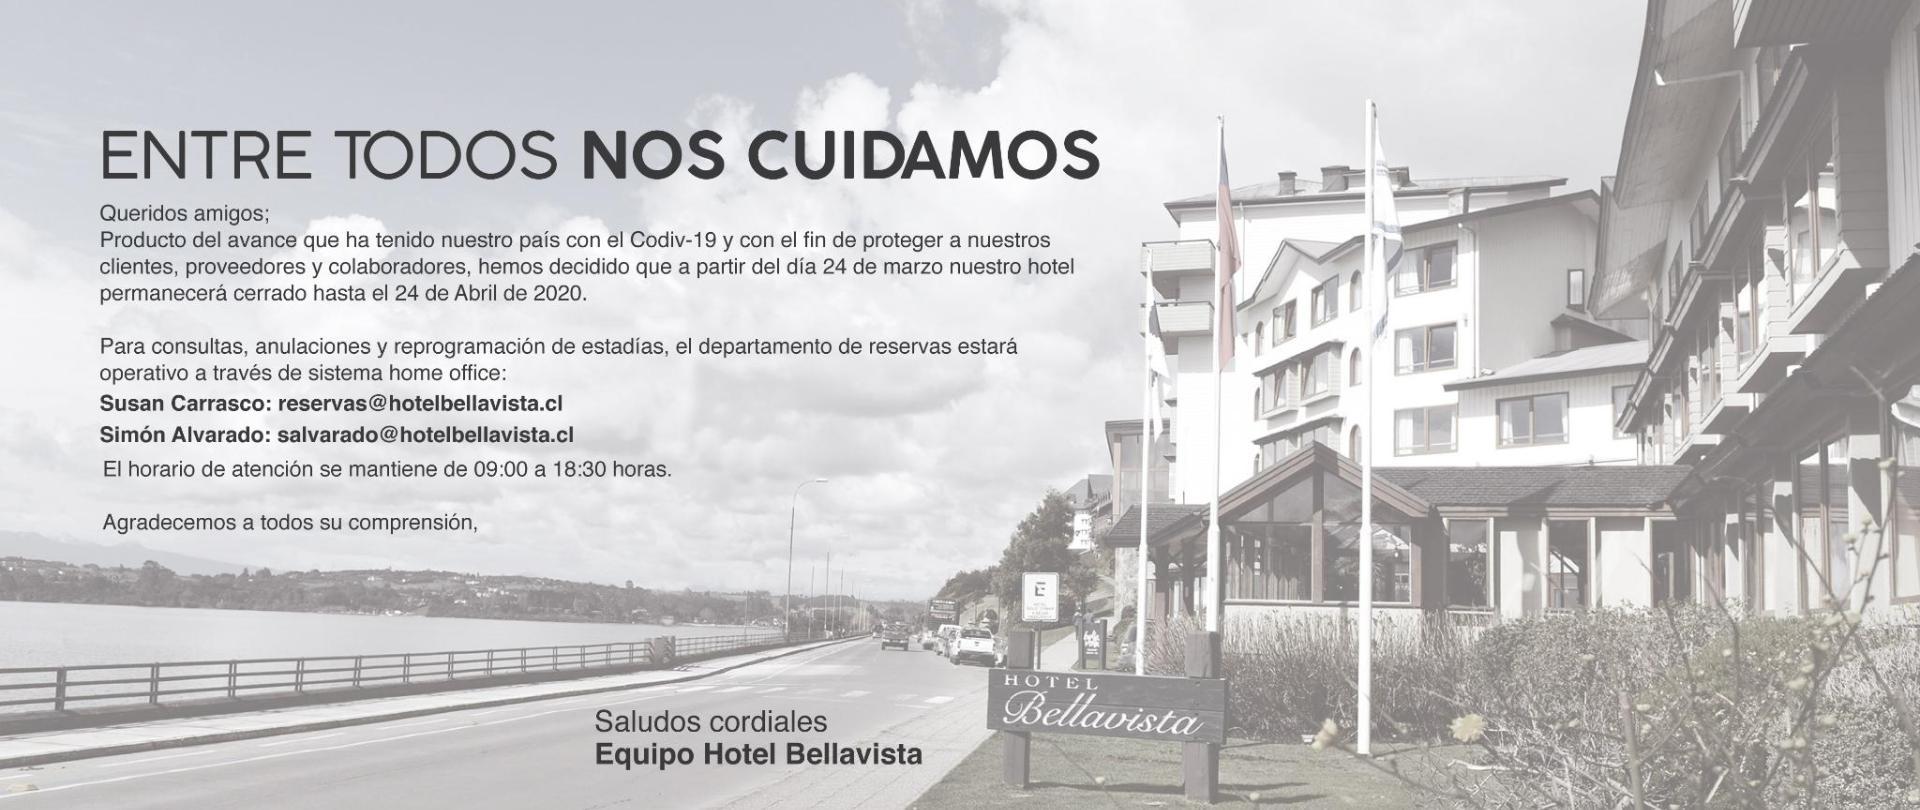 banner cierre hotel_martes-01.jpg